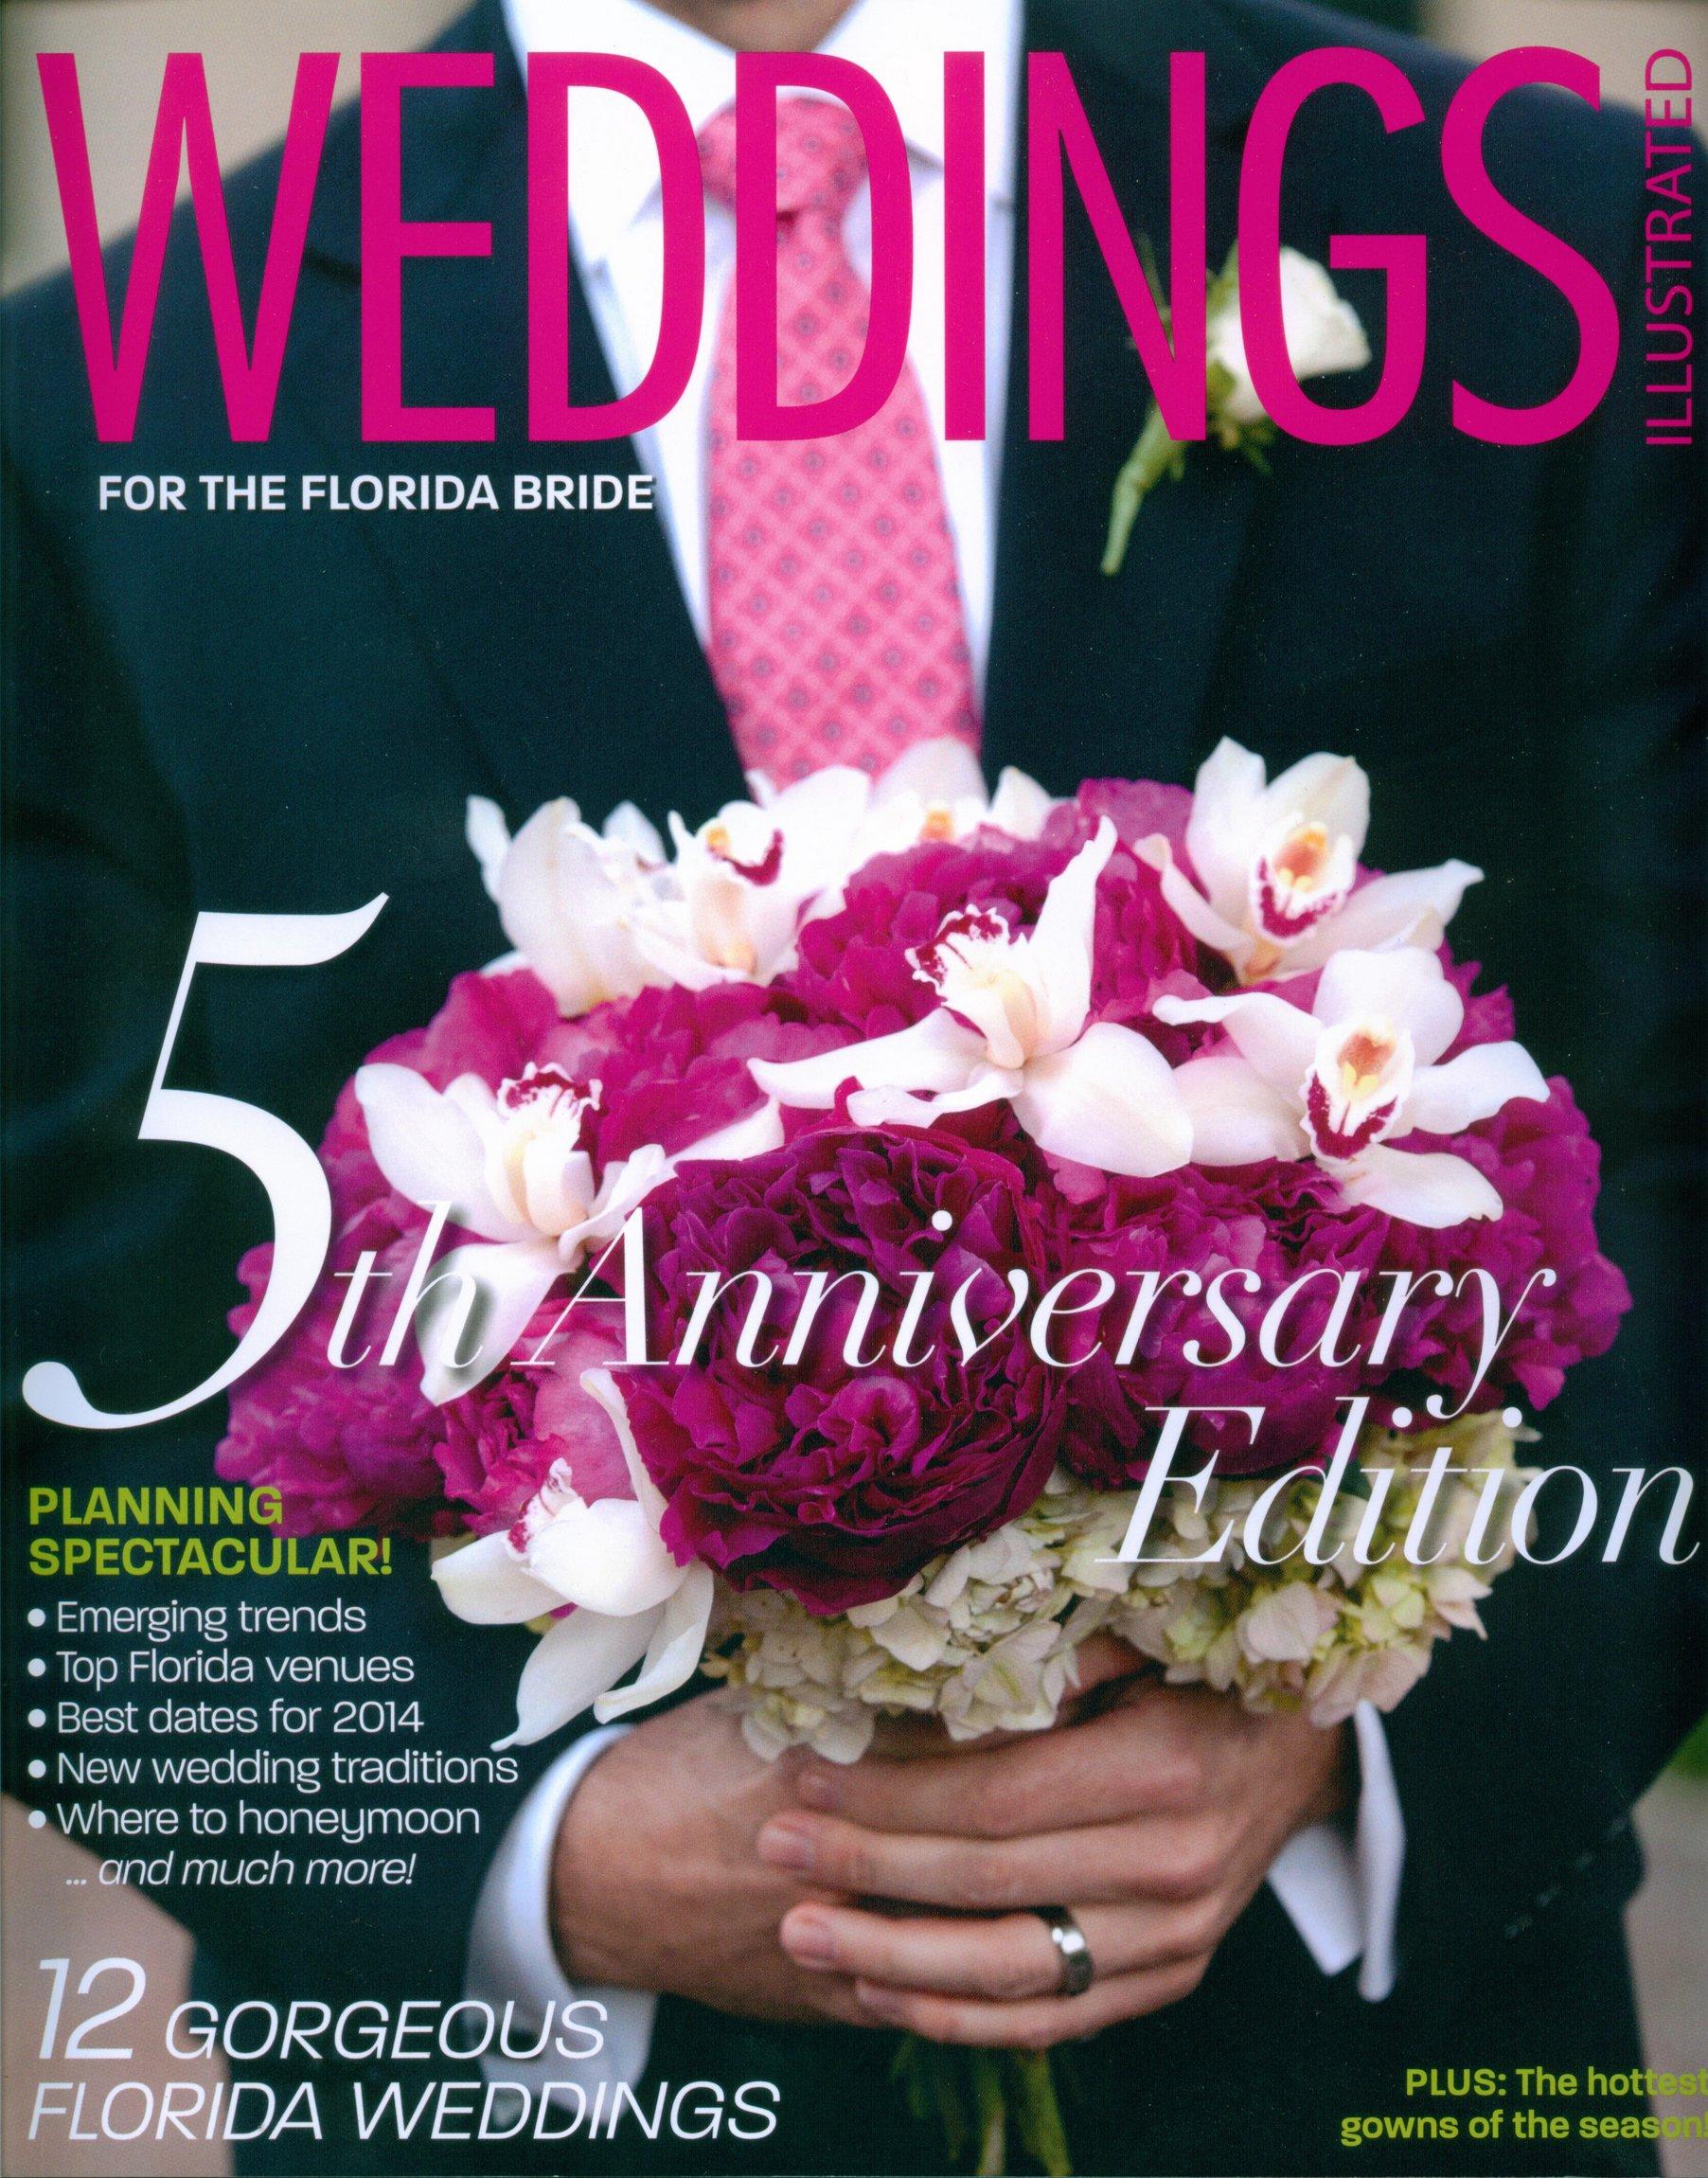 Islamorada Wedding Magazine Published | The Florida Bride | Vanessa + Marc, Miami Wedding Photographers | Häring Photography, Indian Wedding Photographer in Florida, Best Muslim, Hindu - South East Asian Wedding Photographers